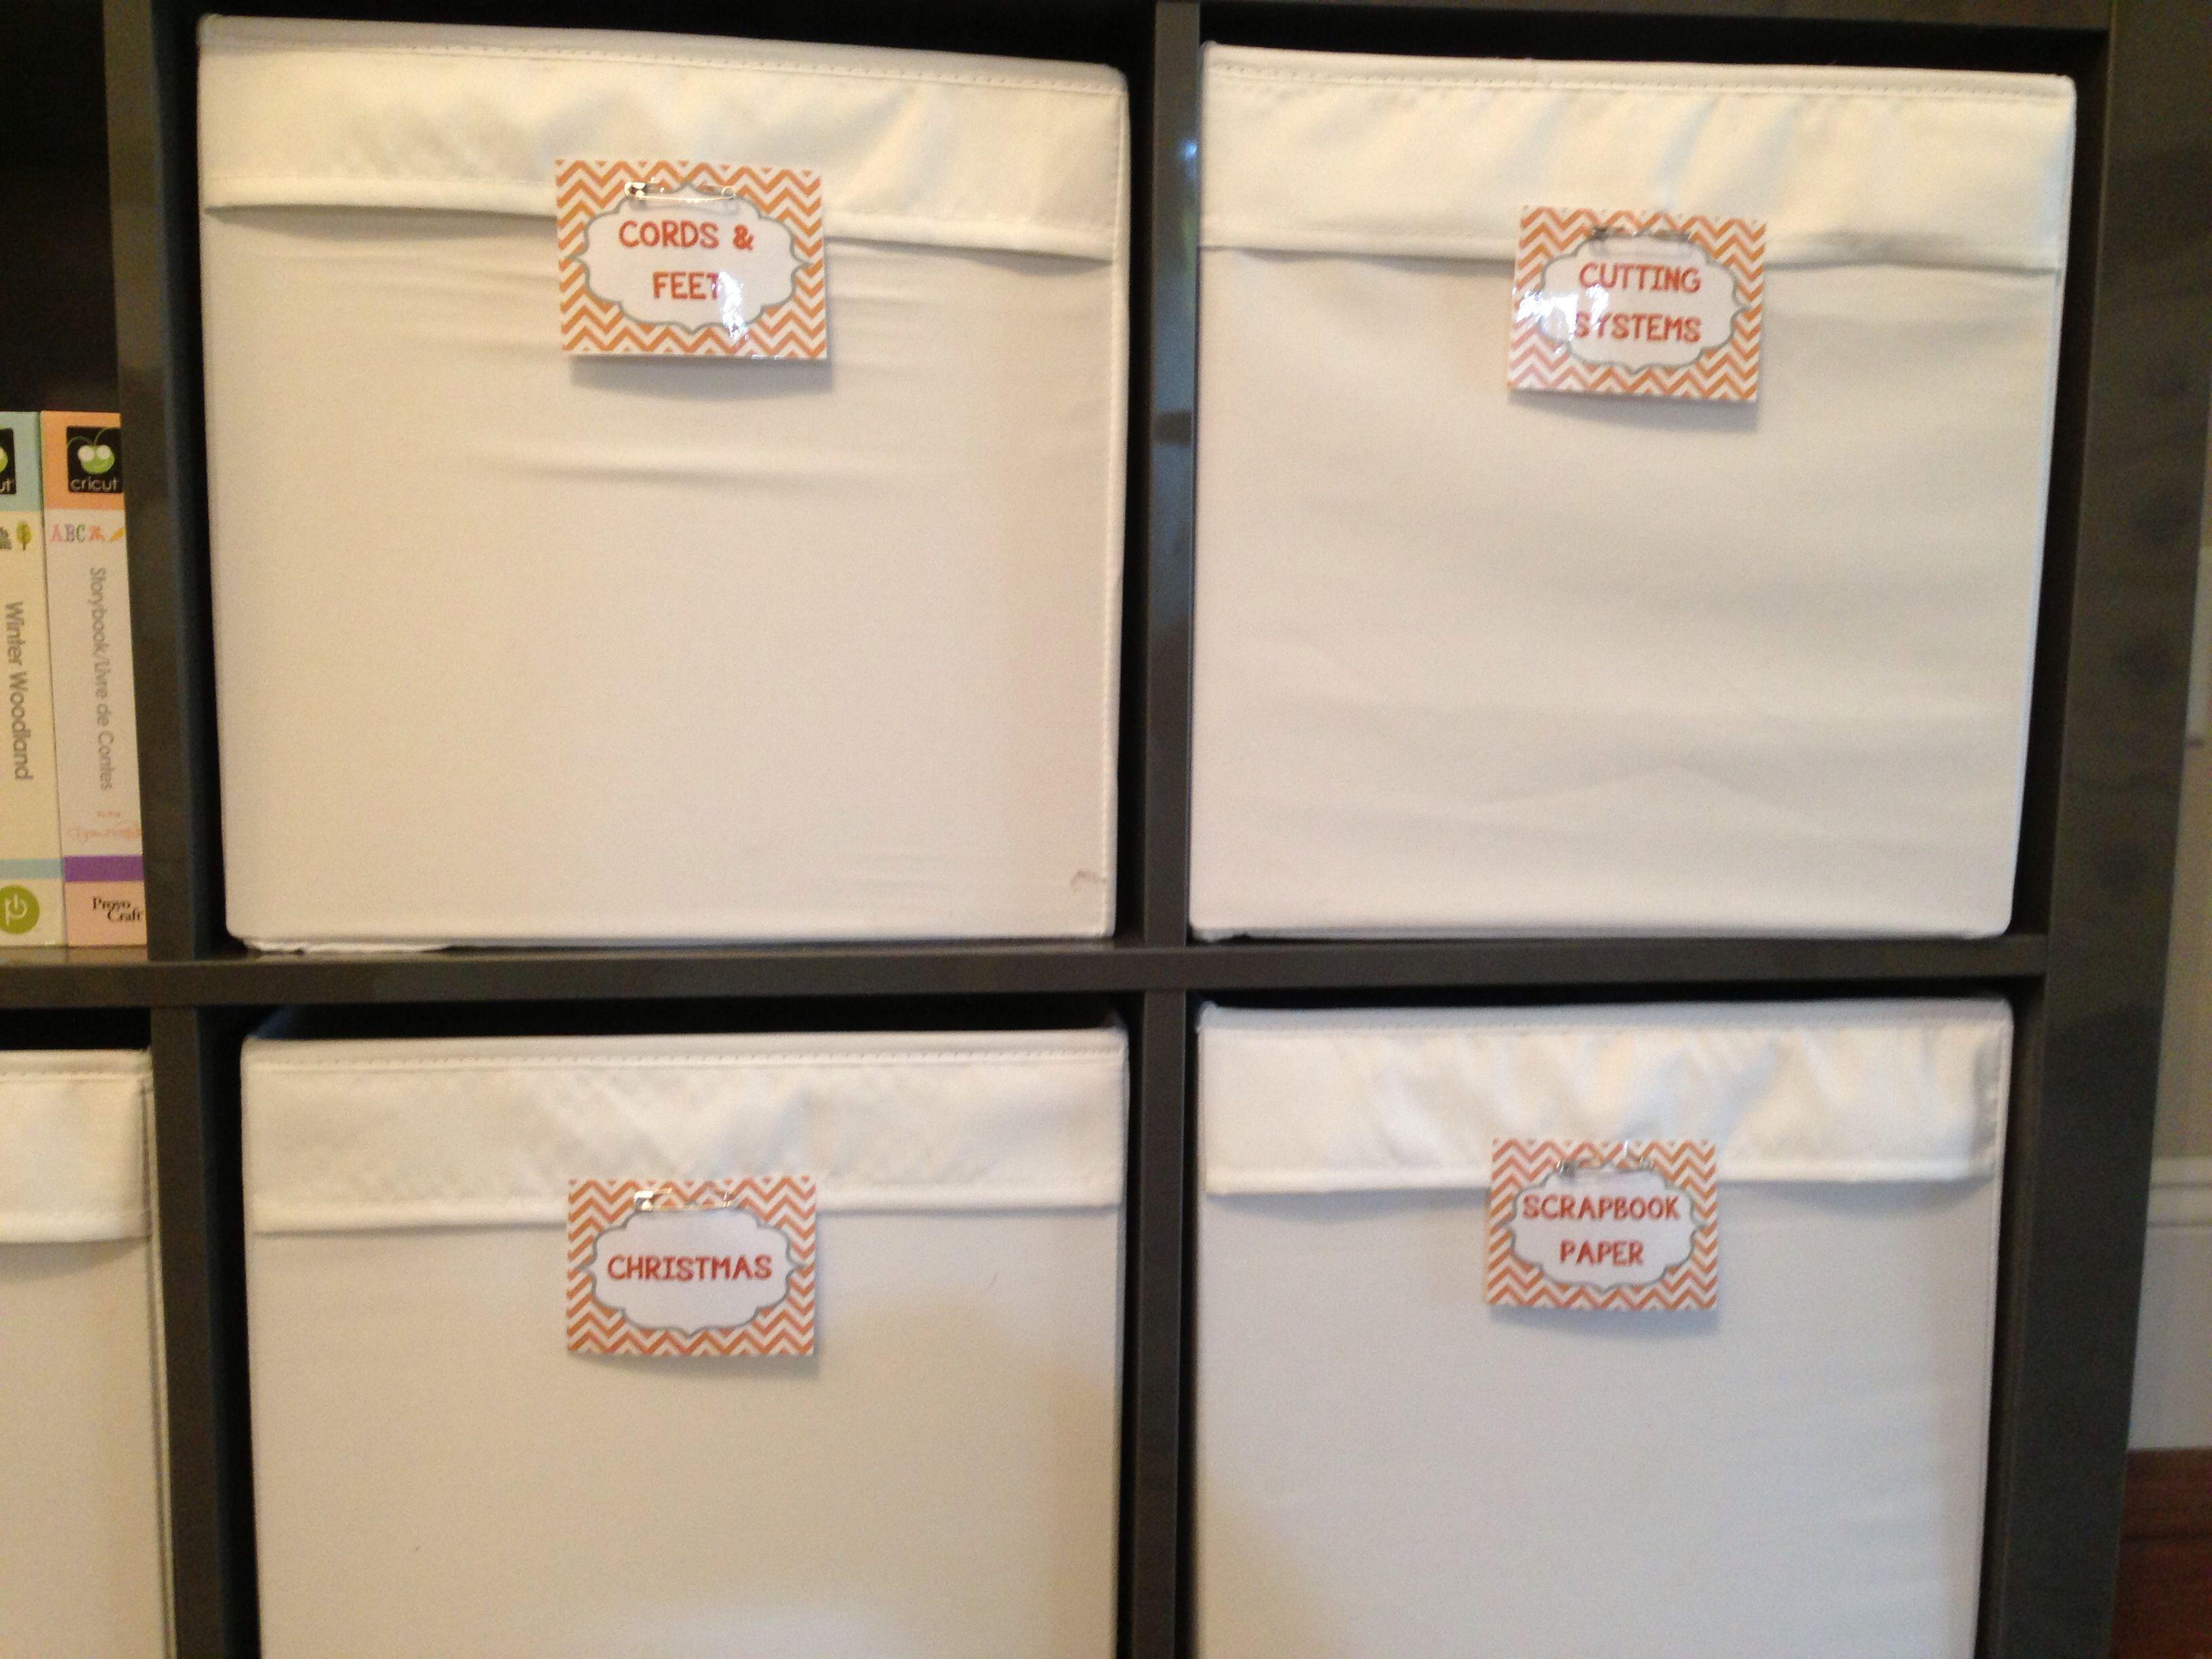 Drona Box Labels In Craft Room Knitting Room Craft Room Craft Organization